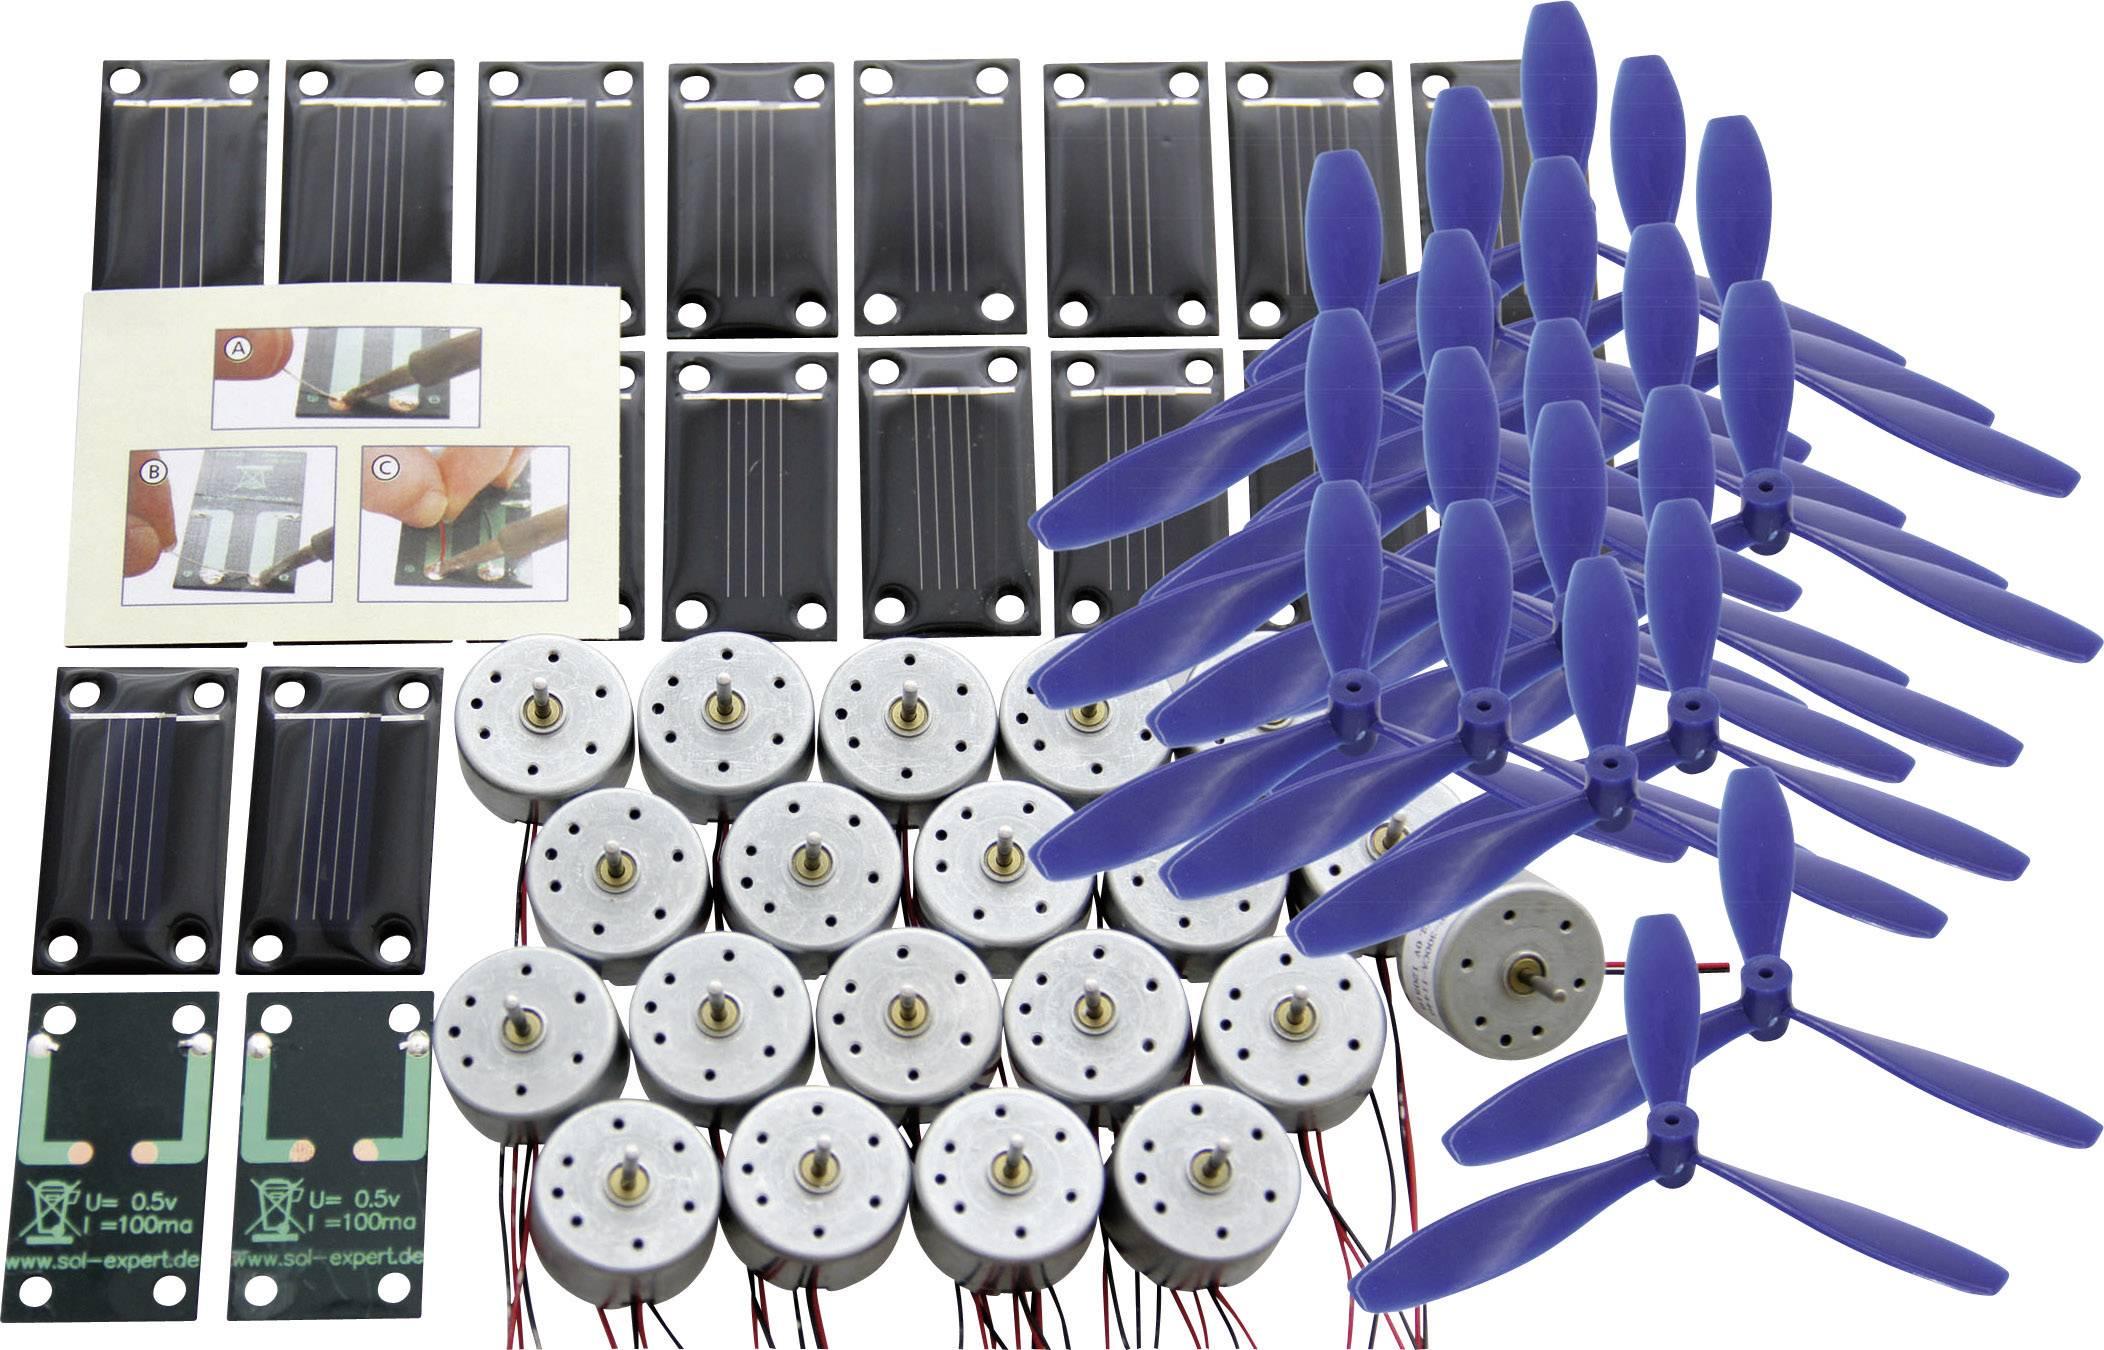 Sada solárního napájení Sol Expert Basic I (77776)